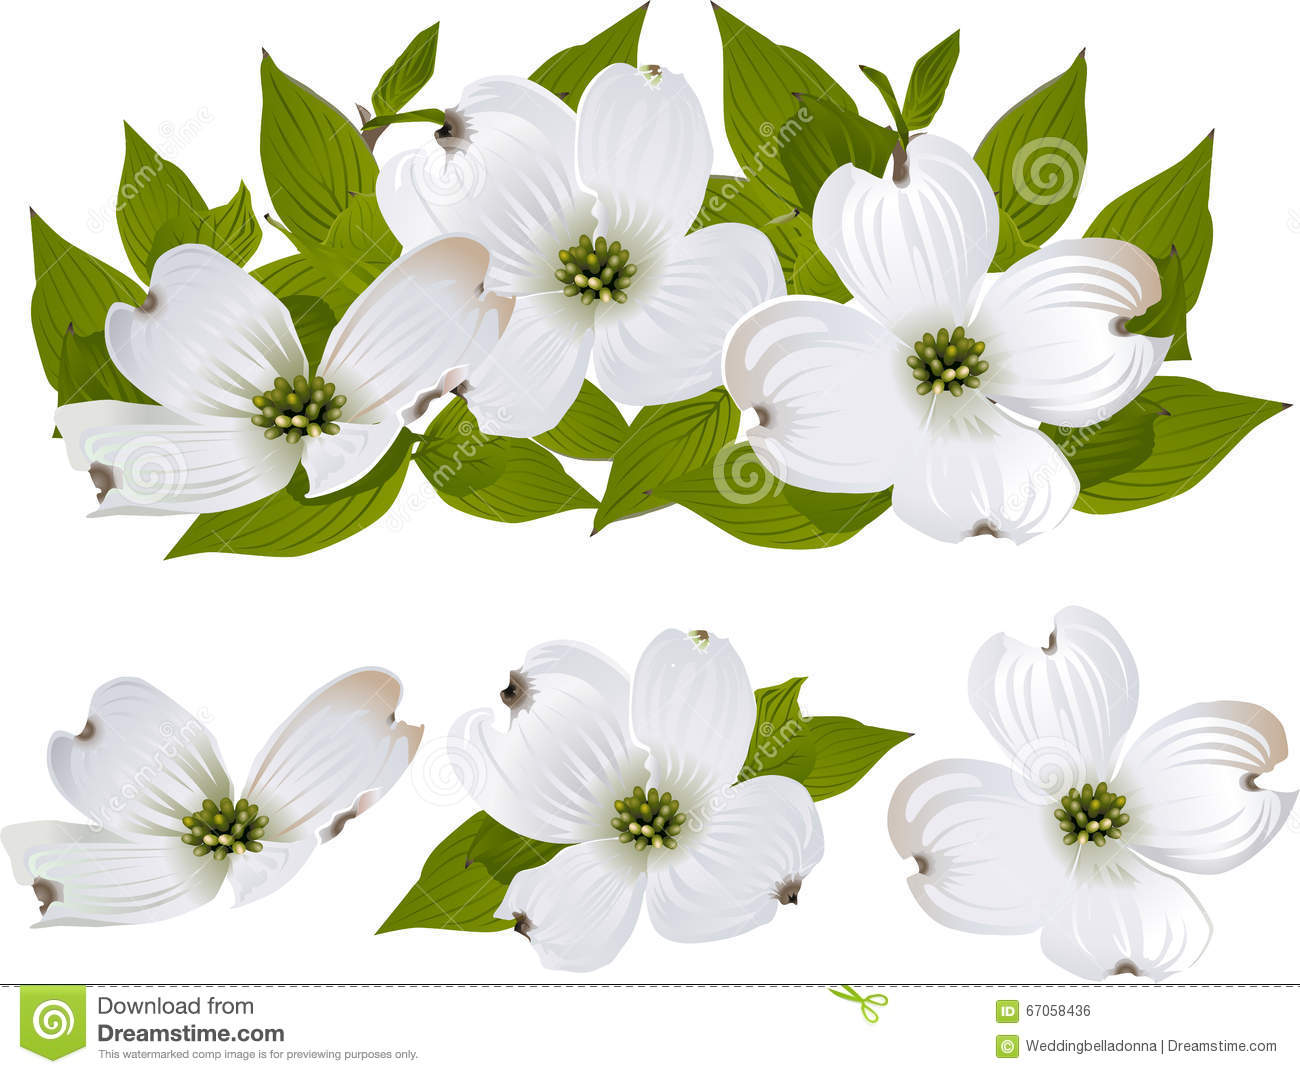 Cornus Blossom clipart #15, Download drawings